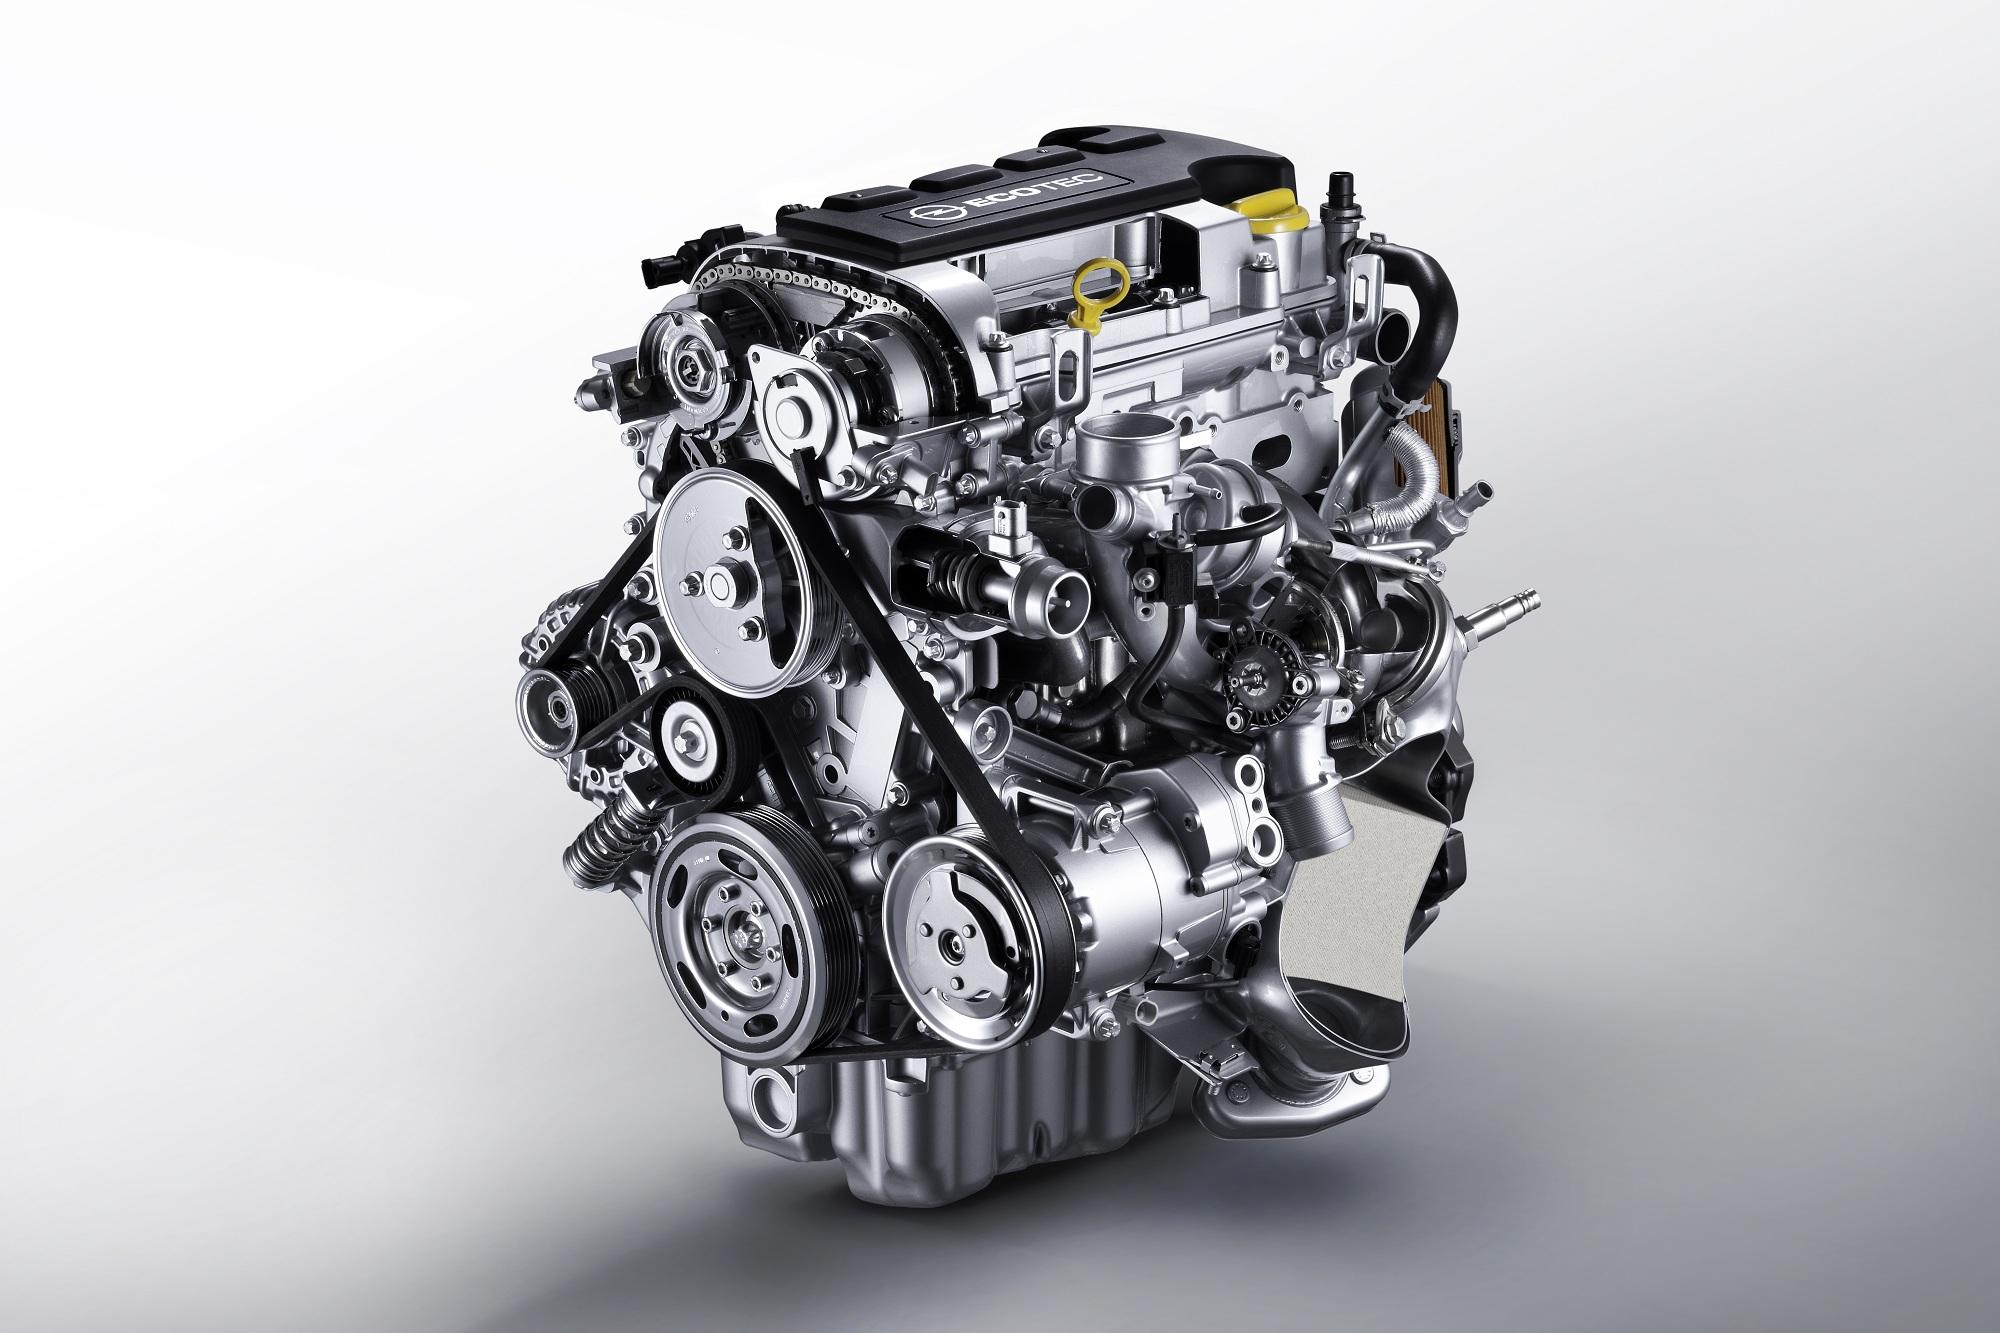 Opel ECOTEC 1.4l Turbo